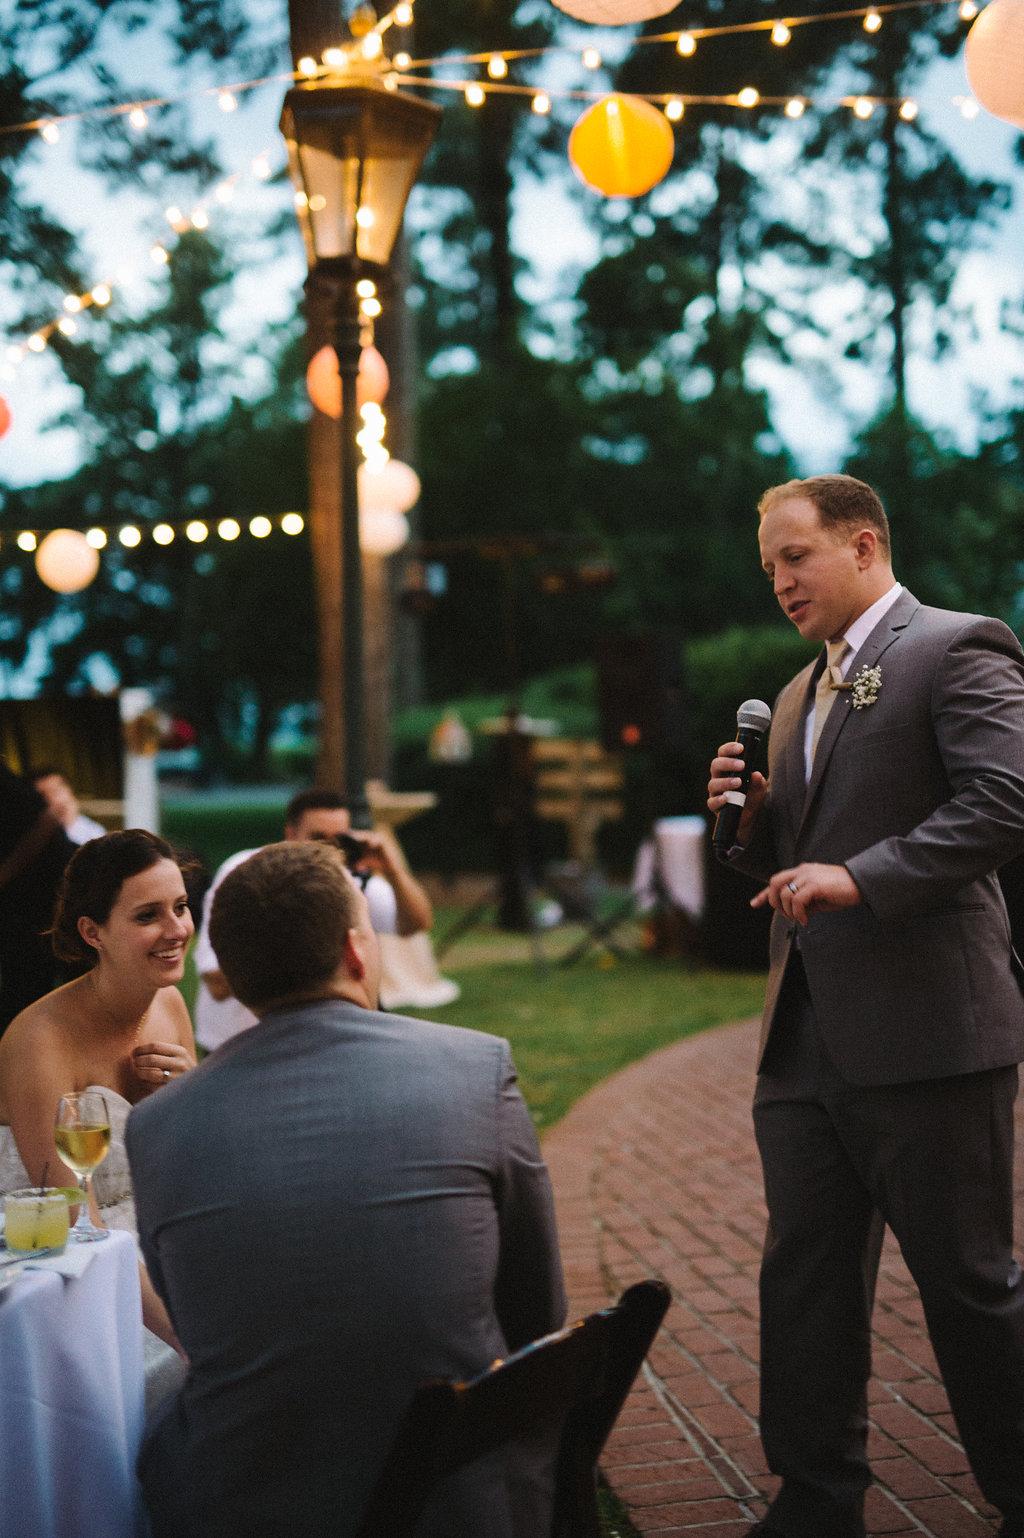 meagan-and-brenden-rach-loves-troy-photography-ivory-and-beau-bridal-boutqiue-ti-adora-wedding-dress-gold-lace-wedding-dress-savannah-wedding-planner-savannah-weddings-oldfield-plantation-wedding-savannah-florist-55.jpg